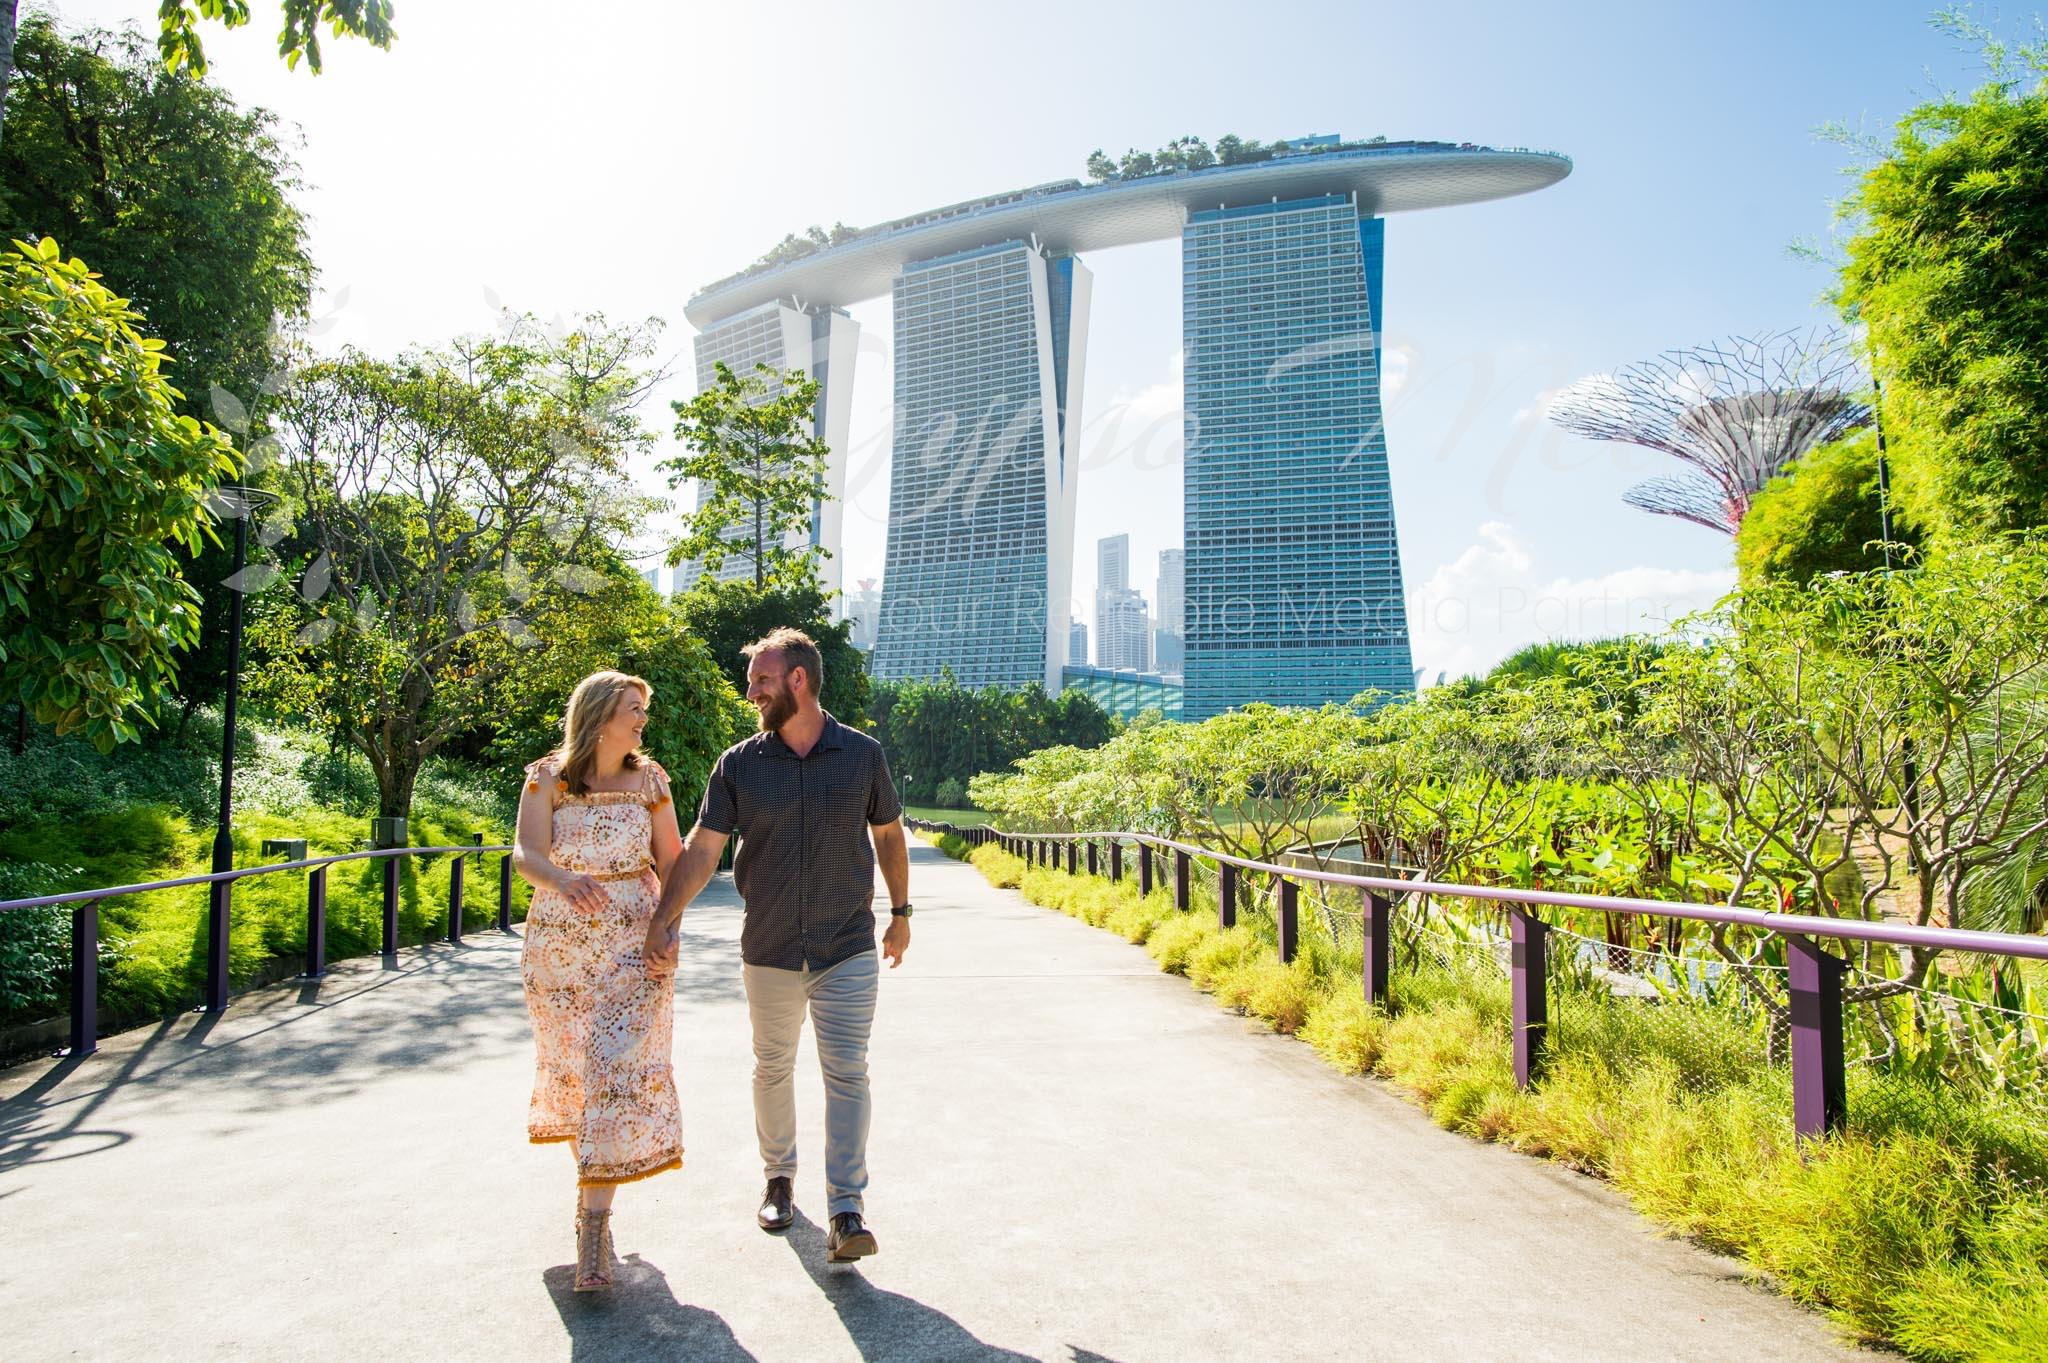 Family Portrait Singapore | Family Photography Singapore